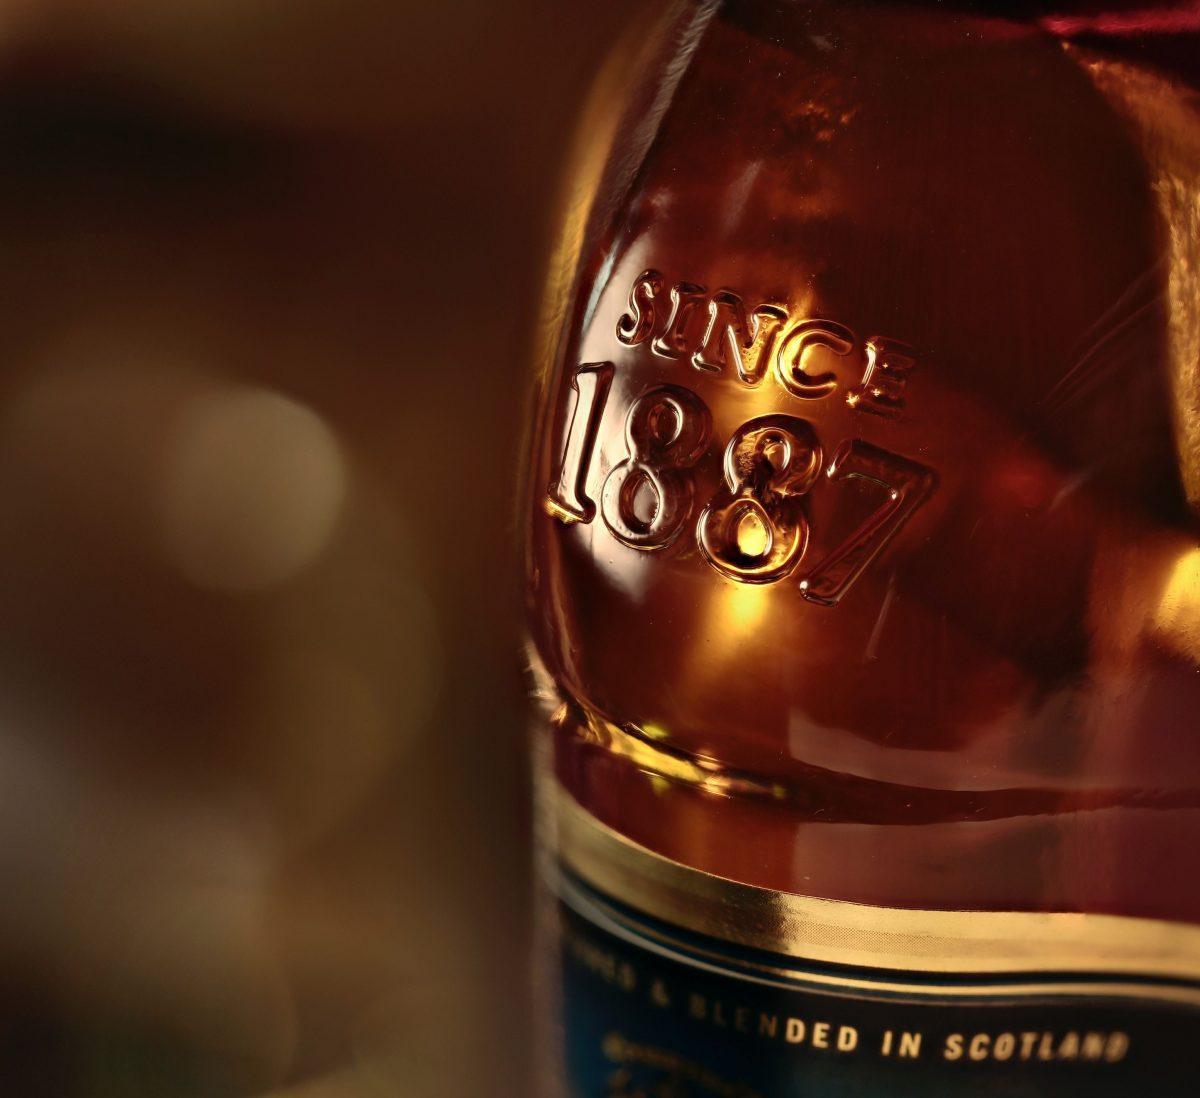 Whiskyproeverij Rondje Schotland! | Cadeaubon